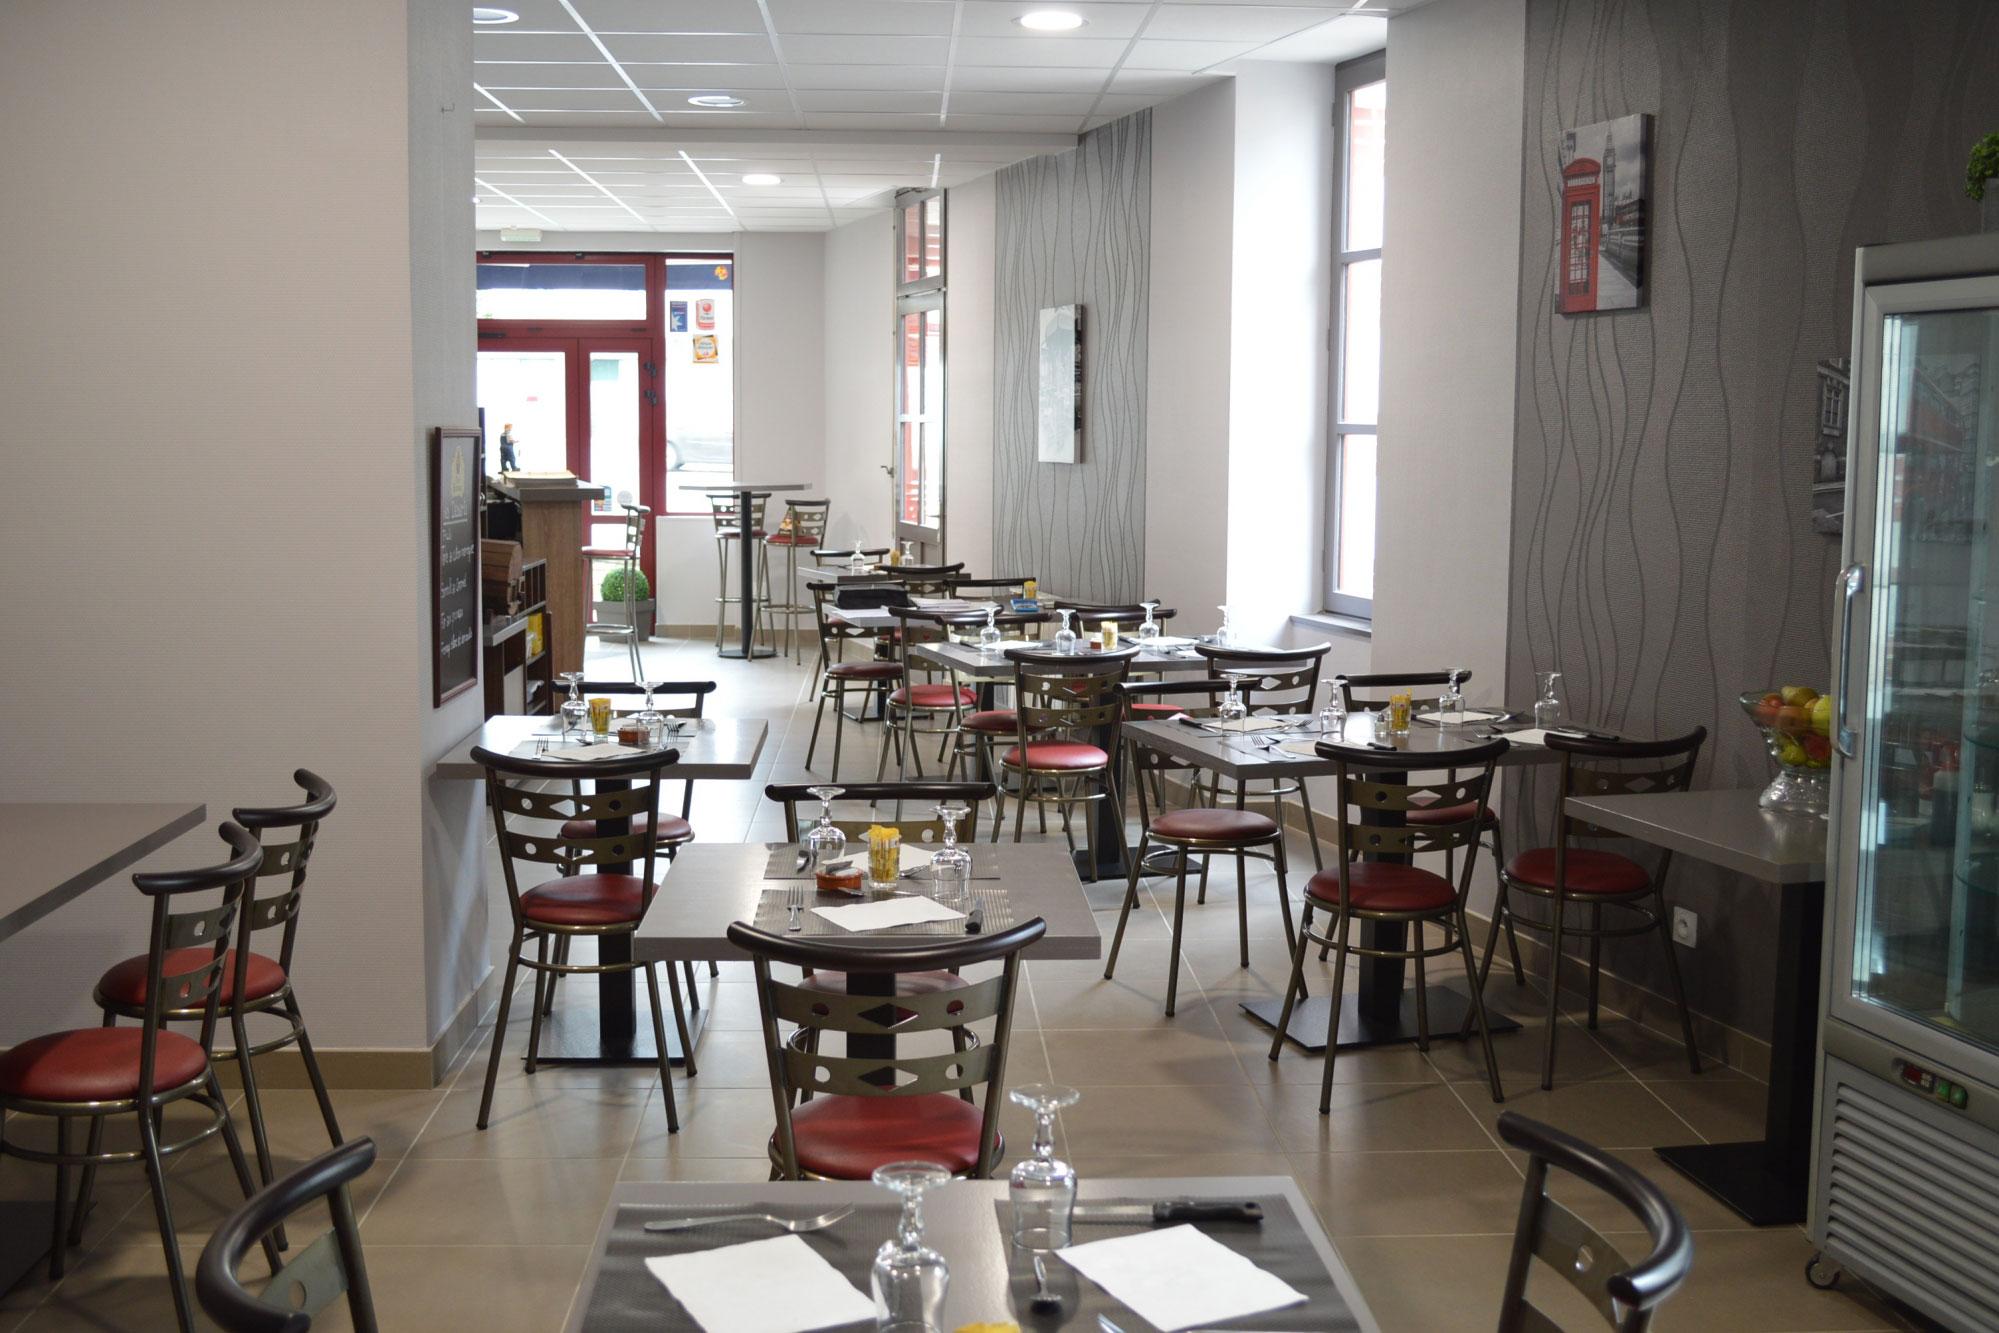 salle-le bistrot gourmand-fegreac-restaurant-traiteur